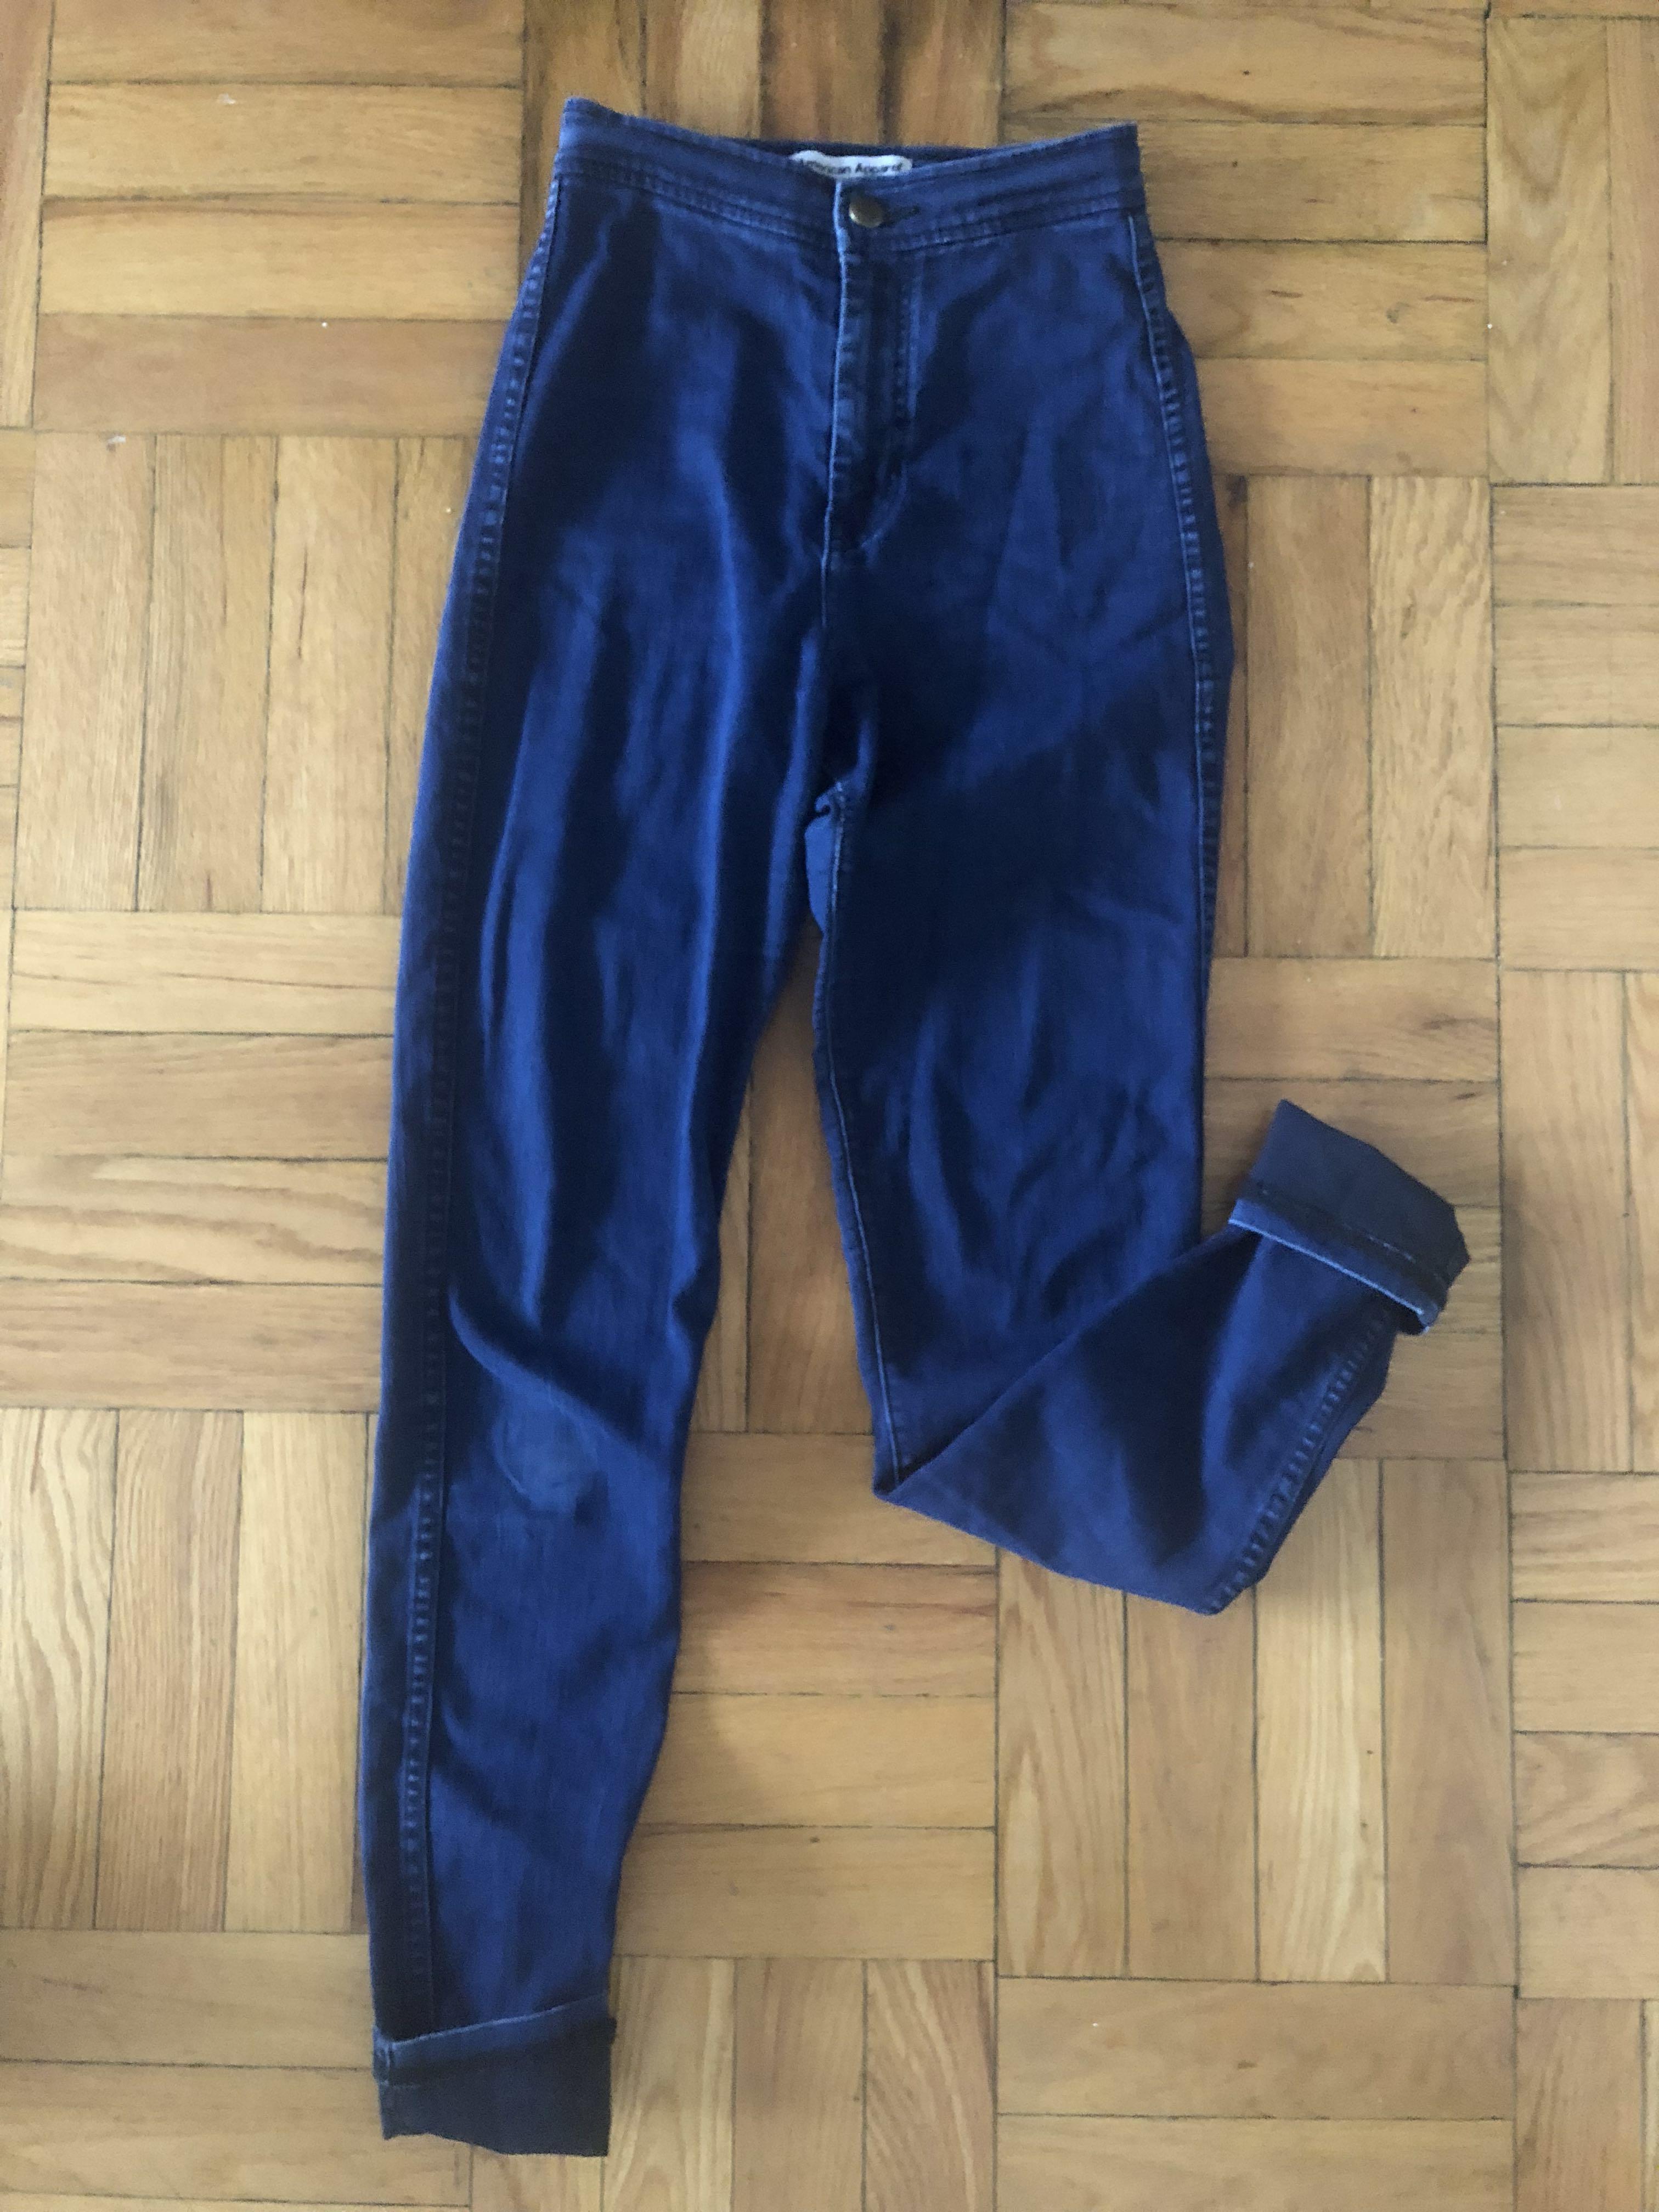 American Apparel High Waisted Indigo Jeans